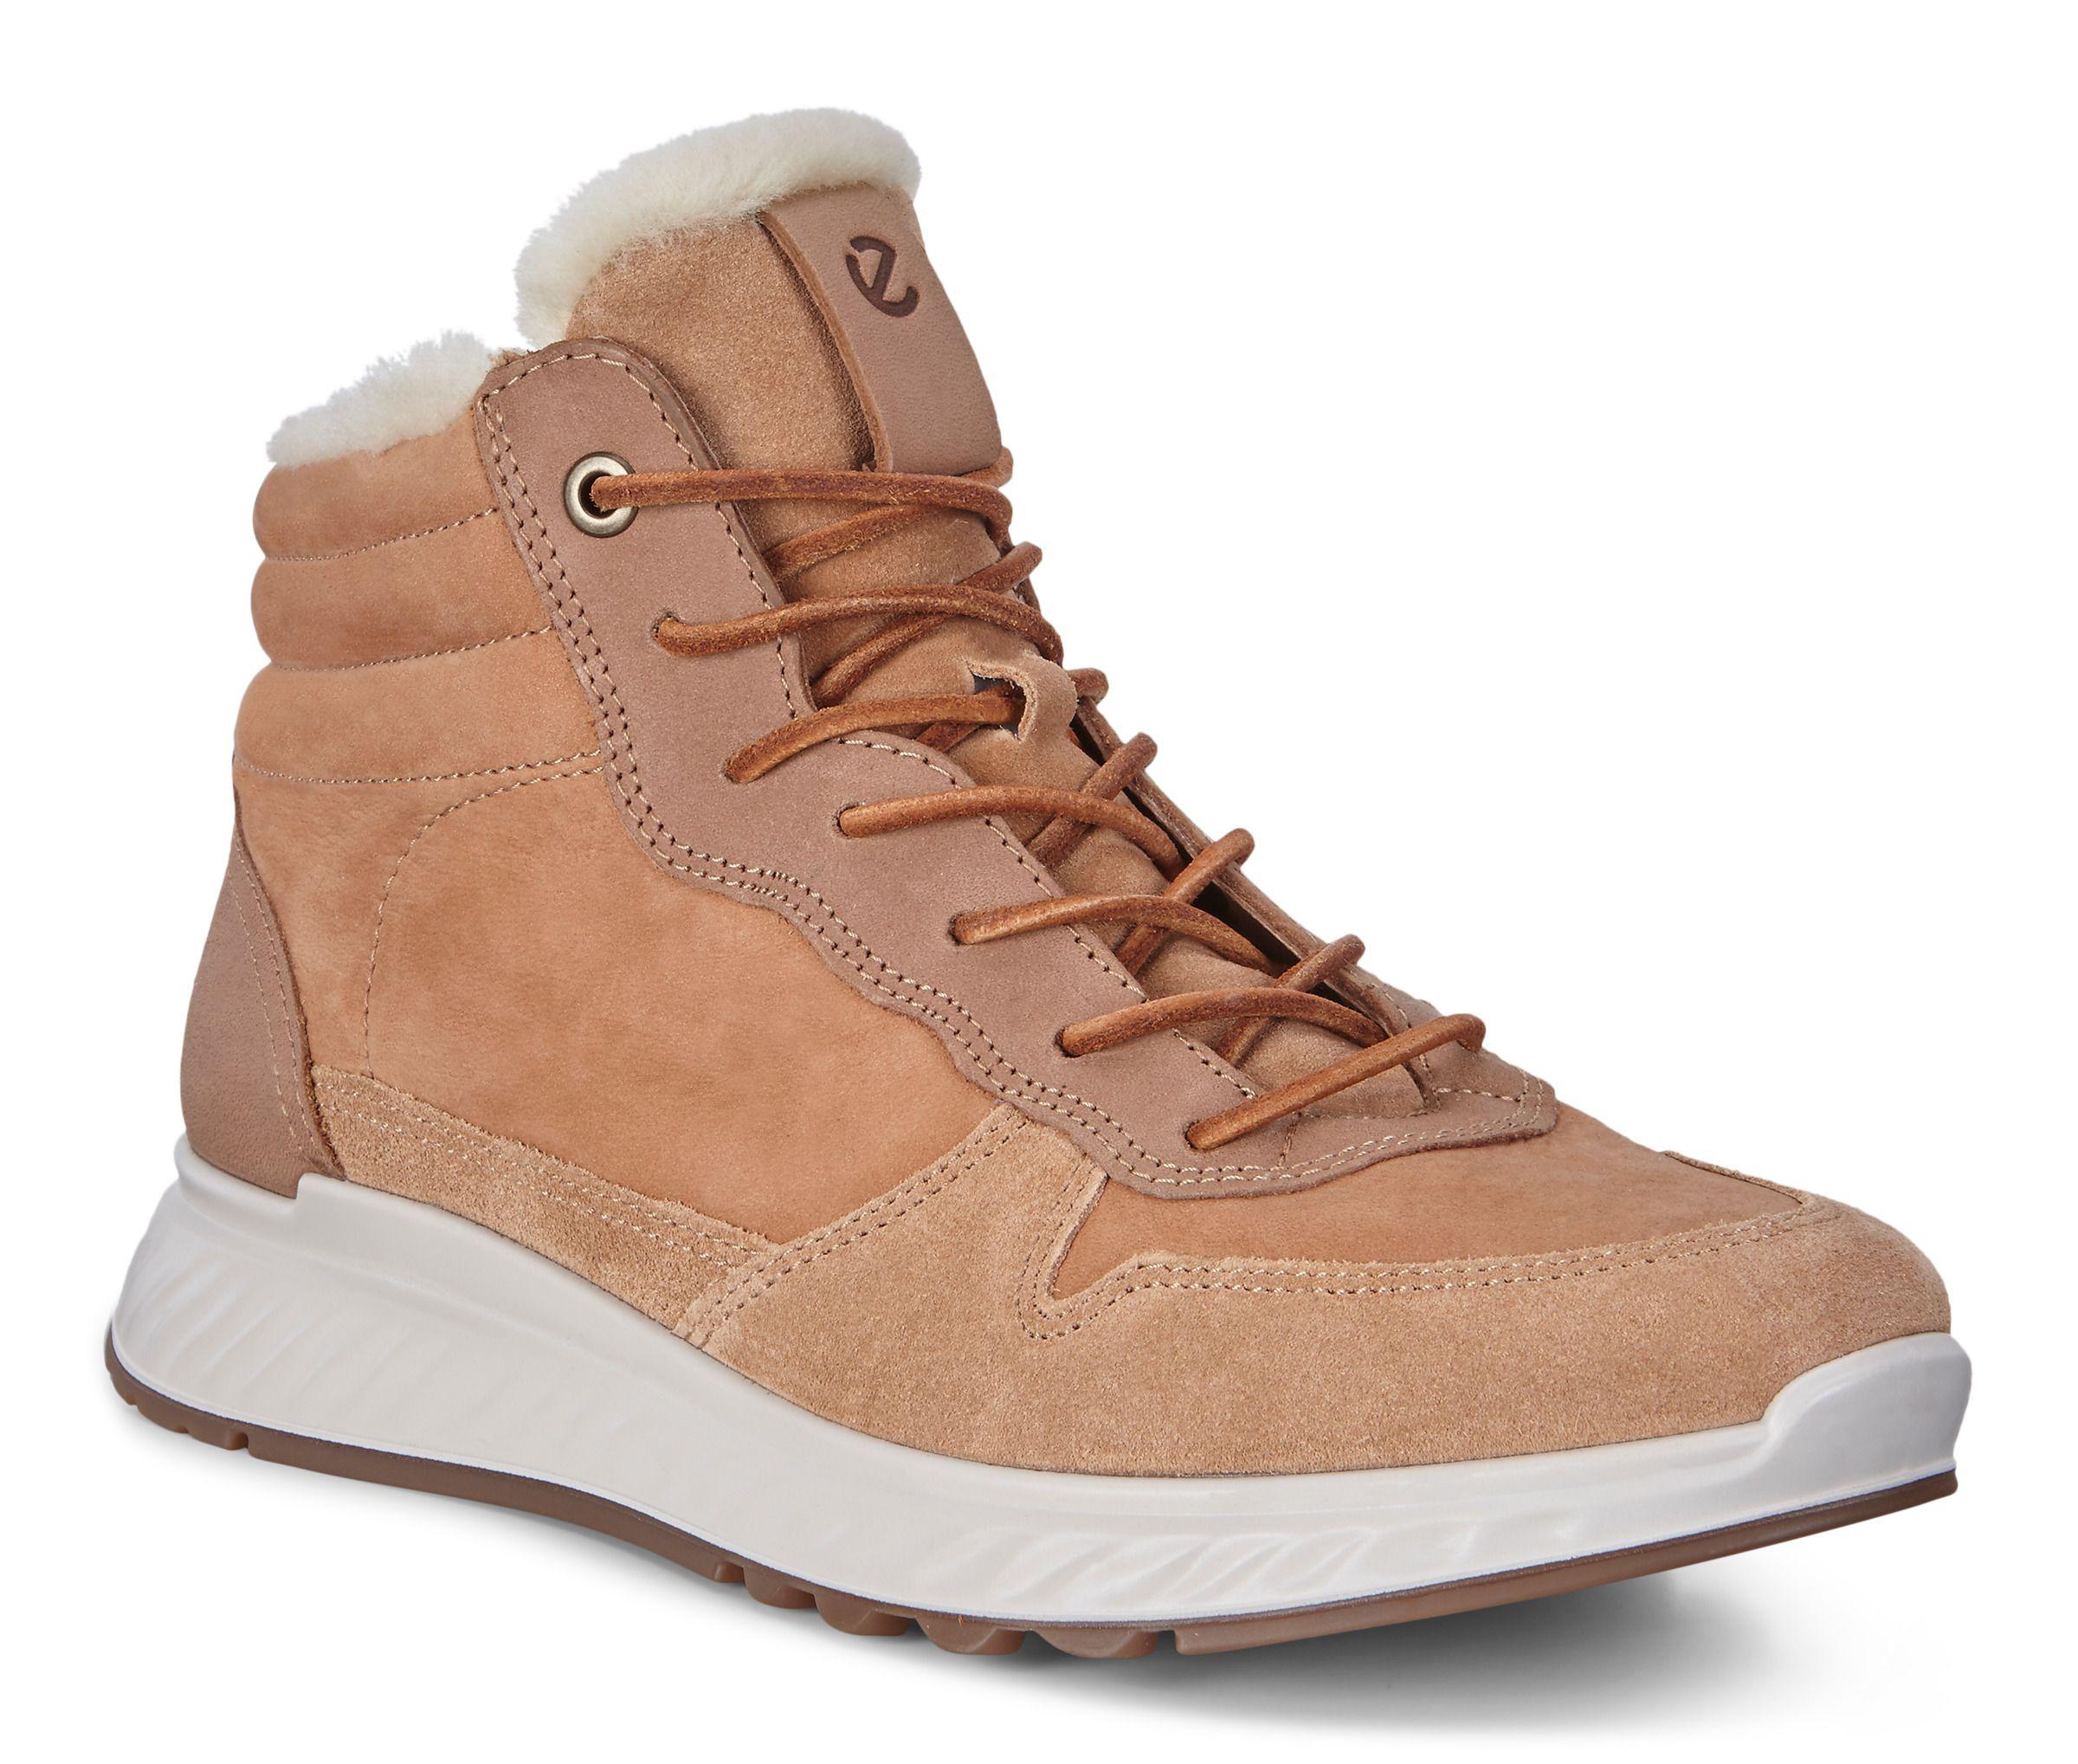 af282fb7a Horma Argentina Zapatos Ancha Horma Zapatos Mujer q48WRg